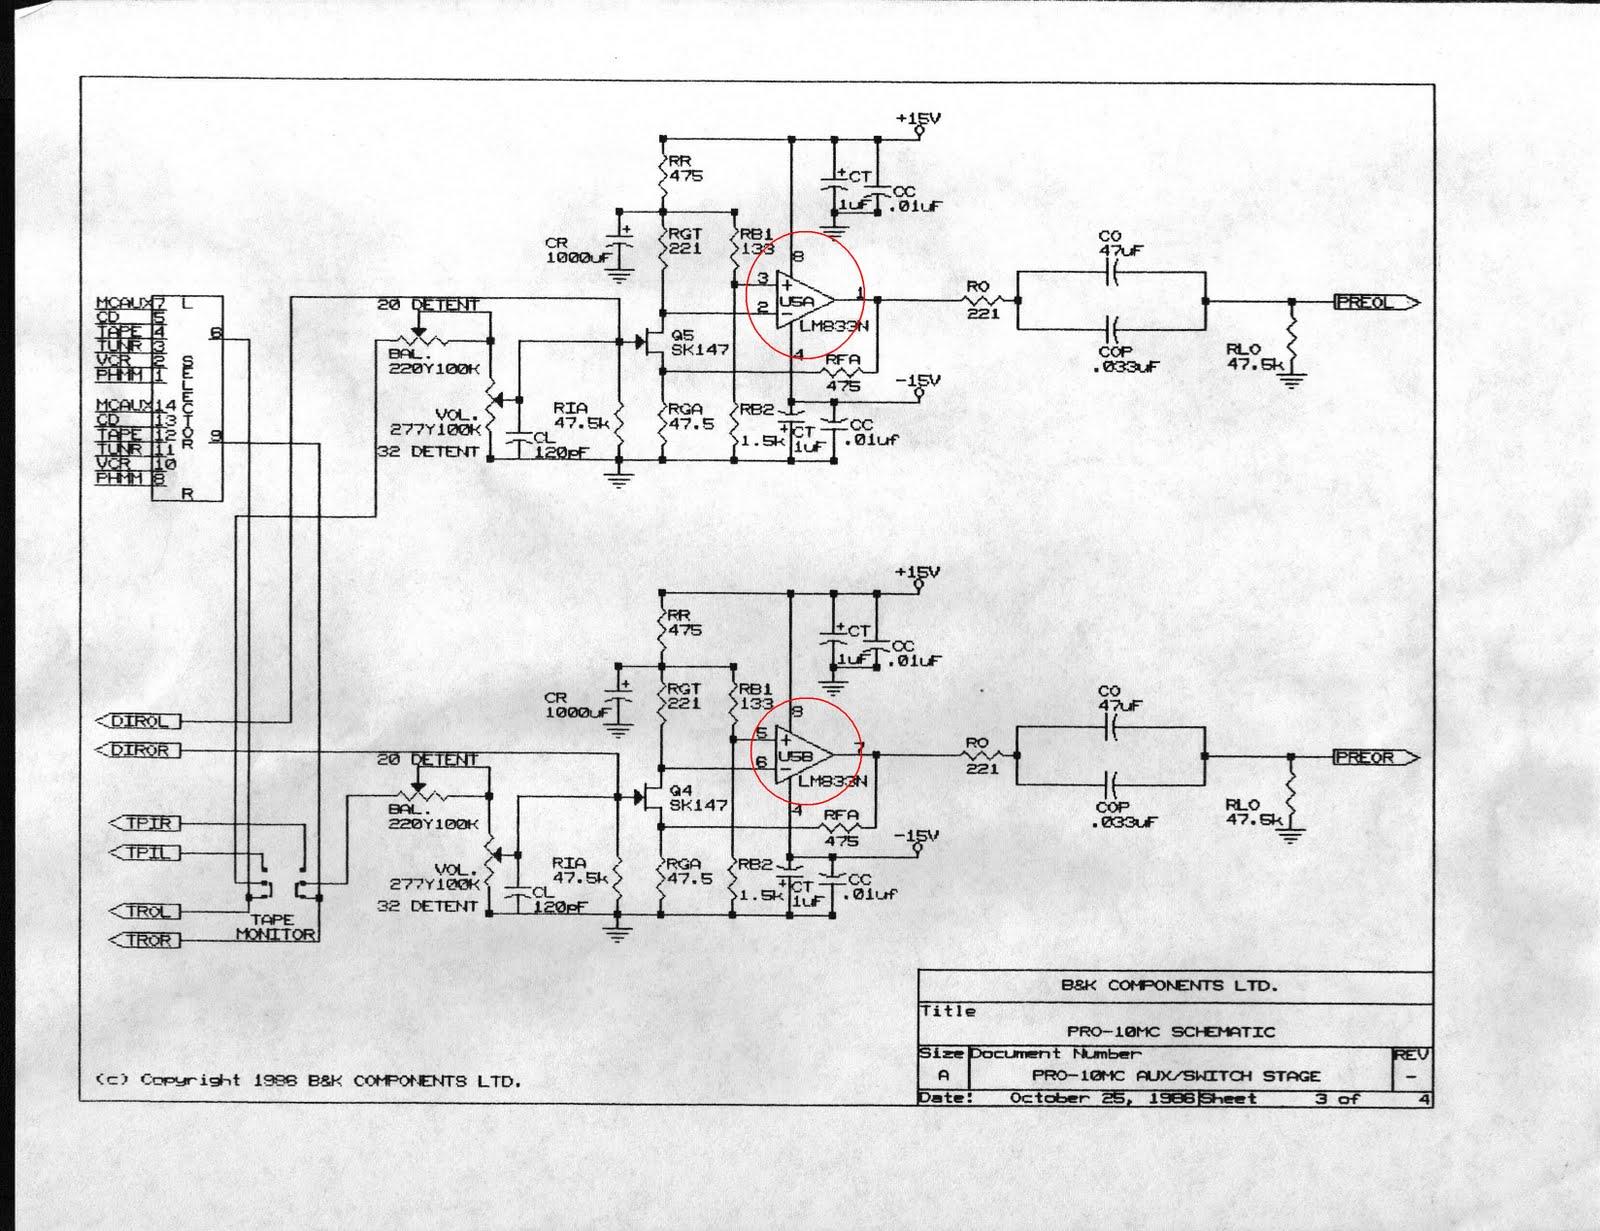 Arcam Alpha 9 Circuit Diagram Books Of Wiring Boilers Diagrams Electrical Control Schematics Solar Power